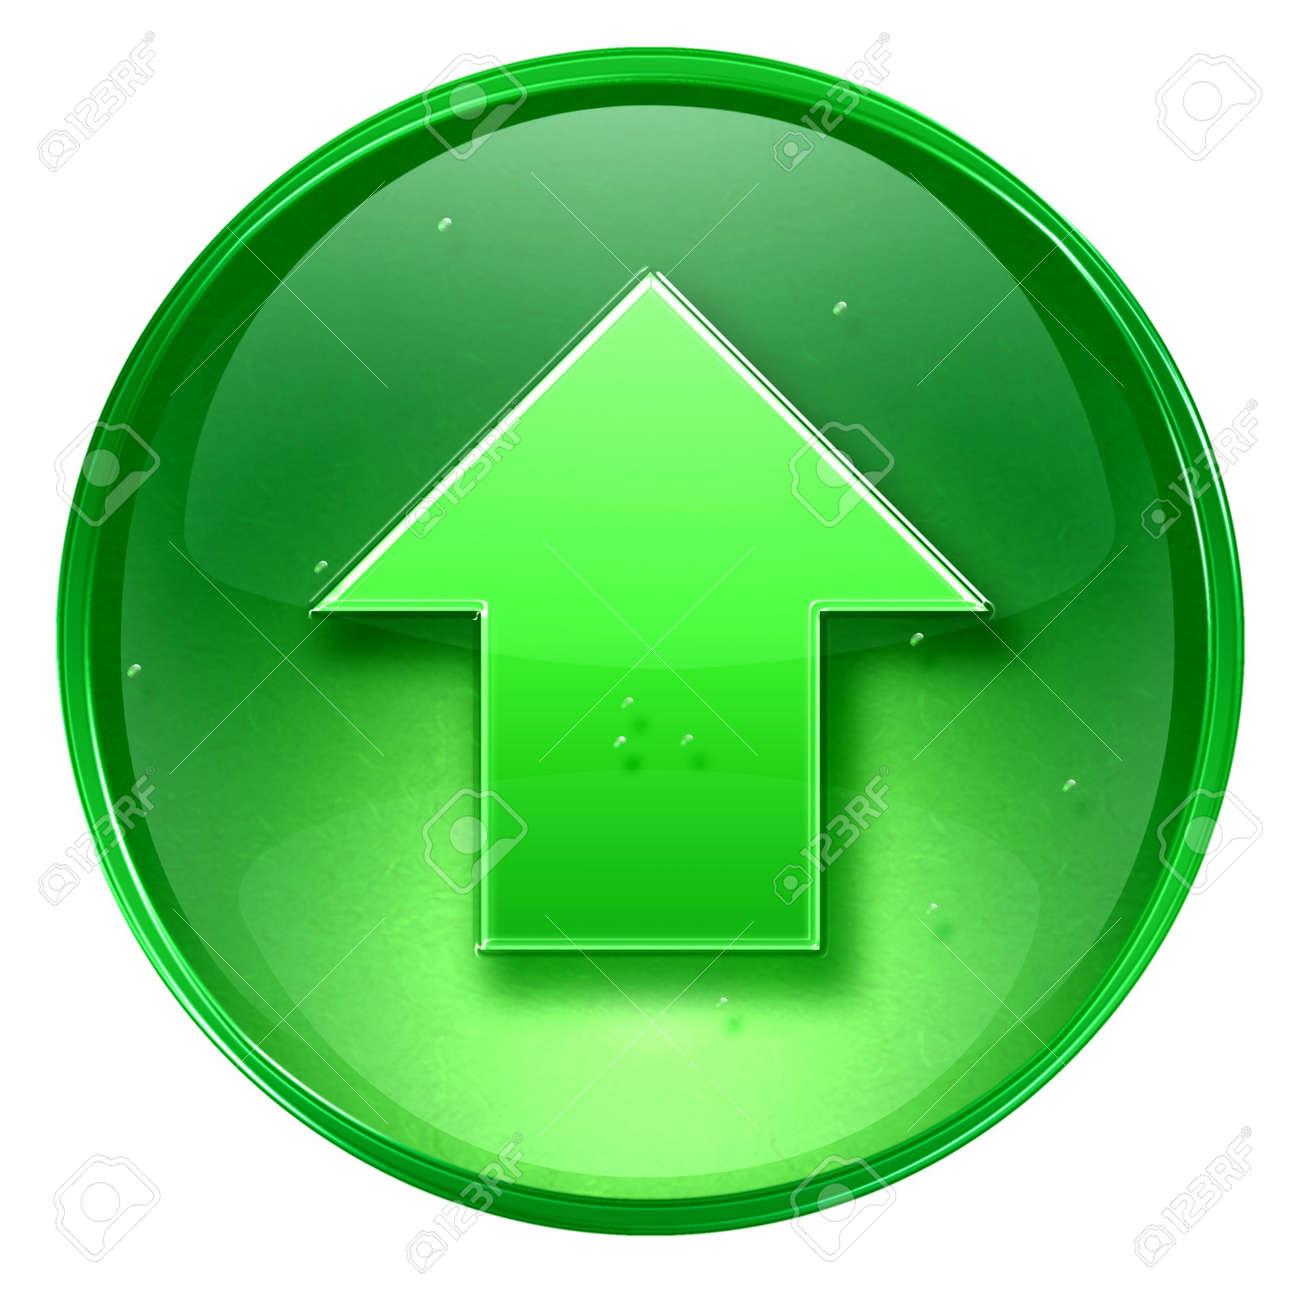 Arrow up icon, isolated on white background. Stock Photo - 1849757